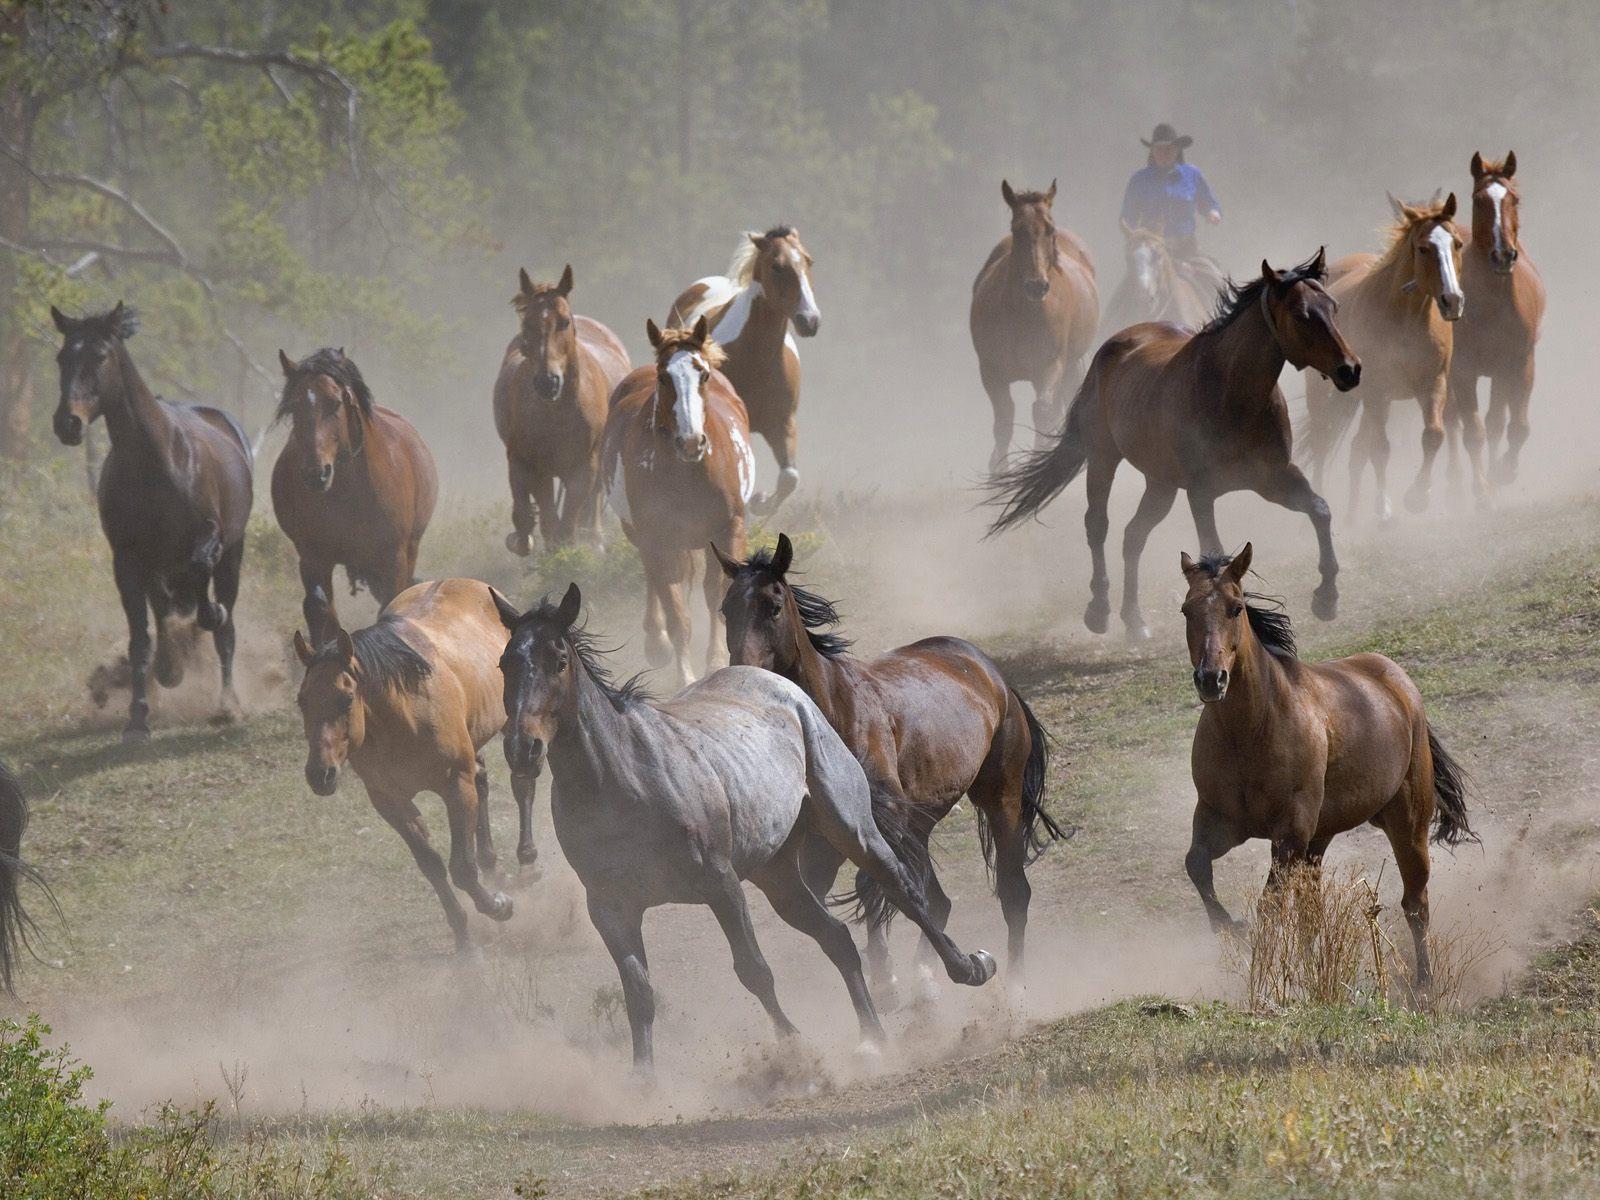 The Cat Running Horses Wallpapers for Desktop Backgrounds 1600x1200